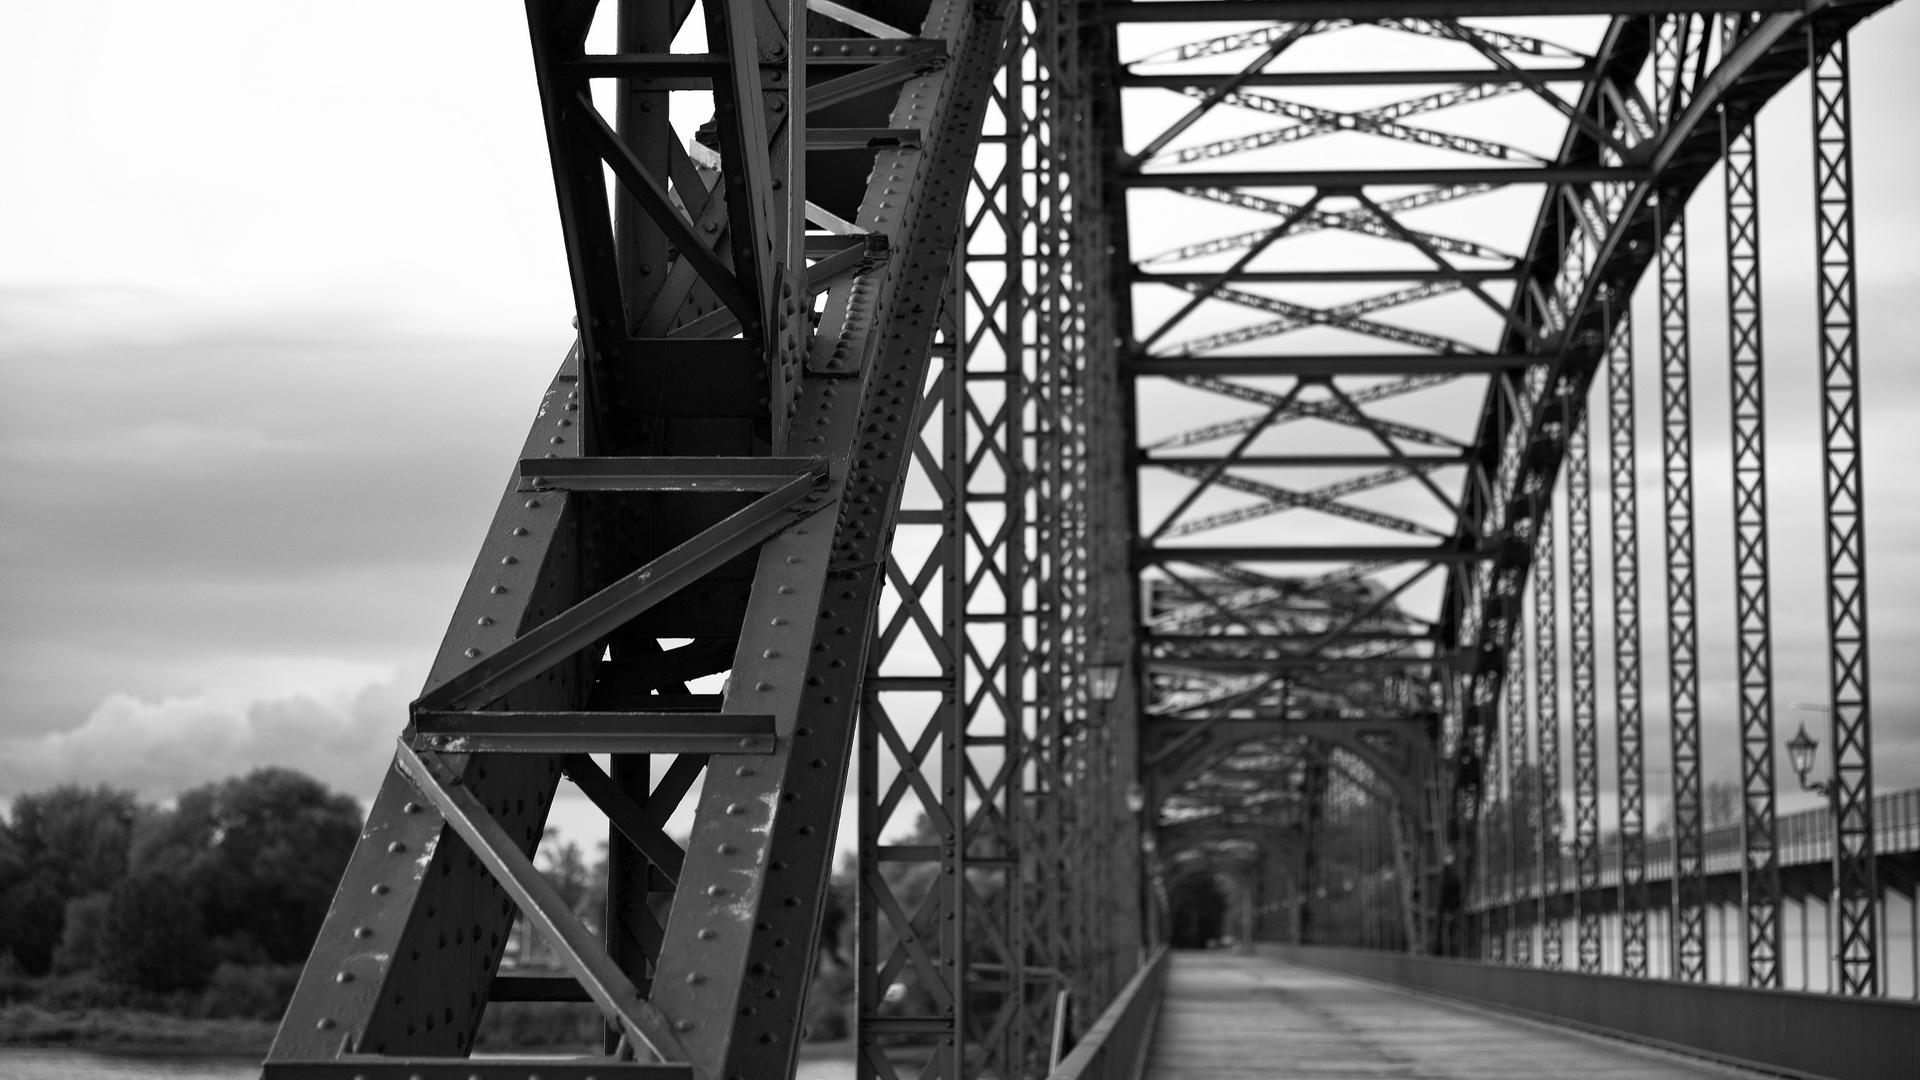 Alte Brücke aus Stahl